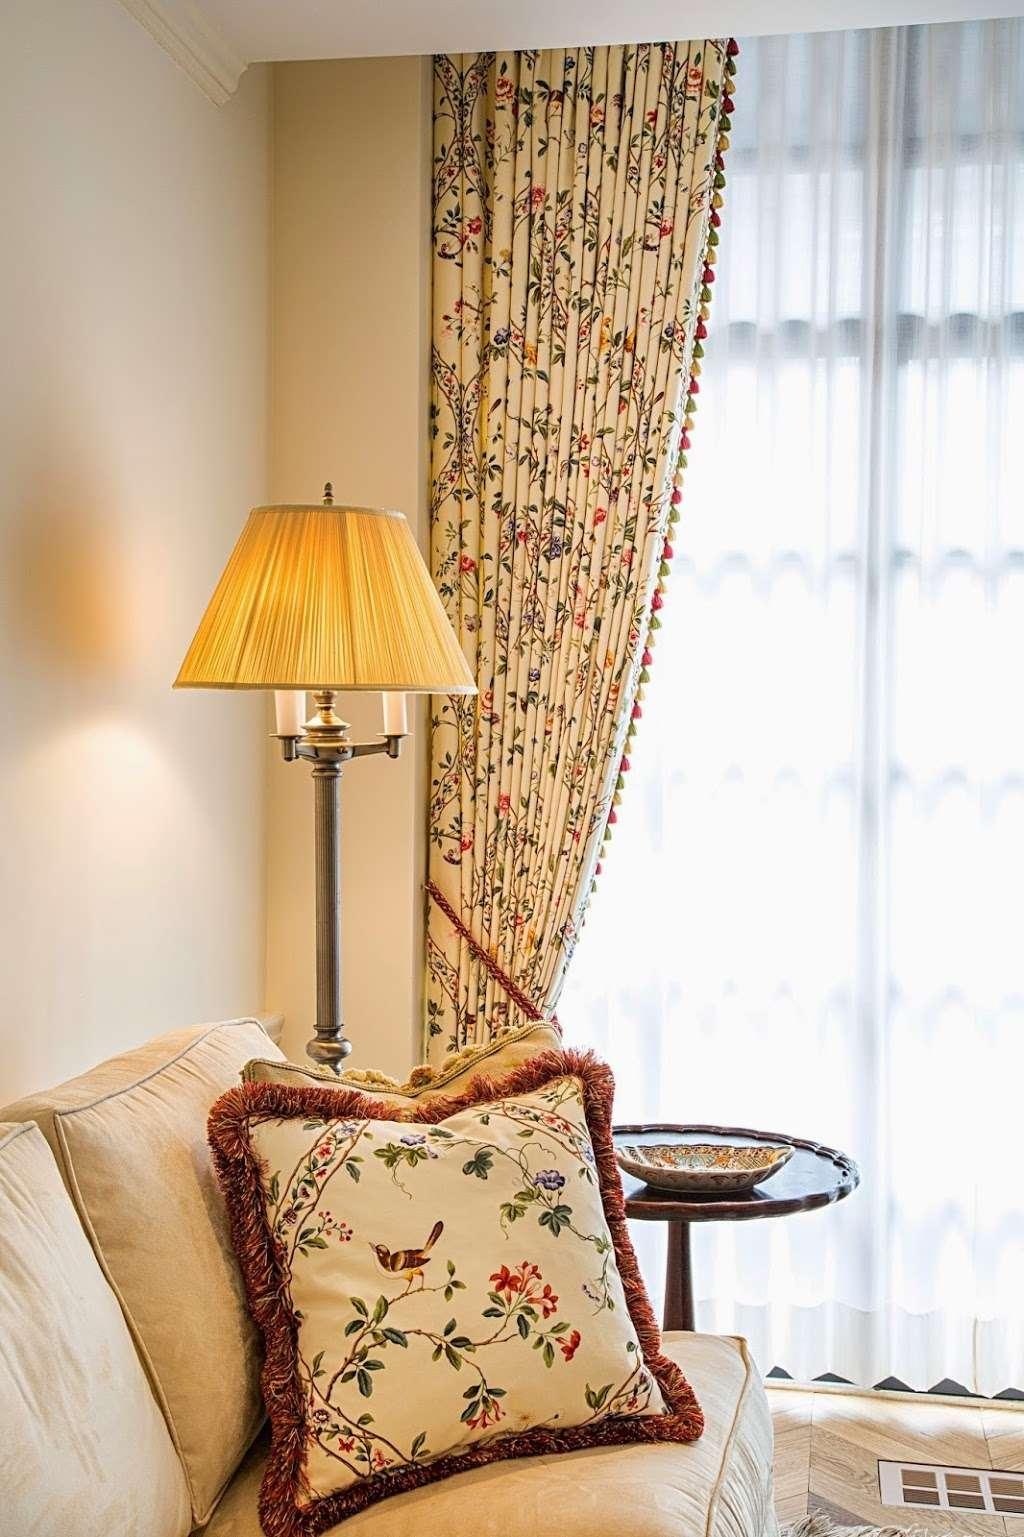 Alan Schatzberg & Associates Inc - furniture store  | Photo 10 of 10 | Address: 45 Ruta Ct, South Hackensack, NJ 07606, USA | Phone: (201) 440-8855